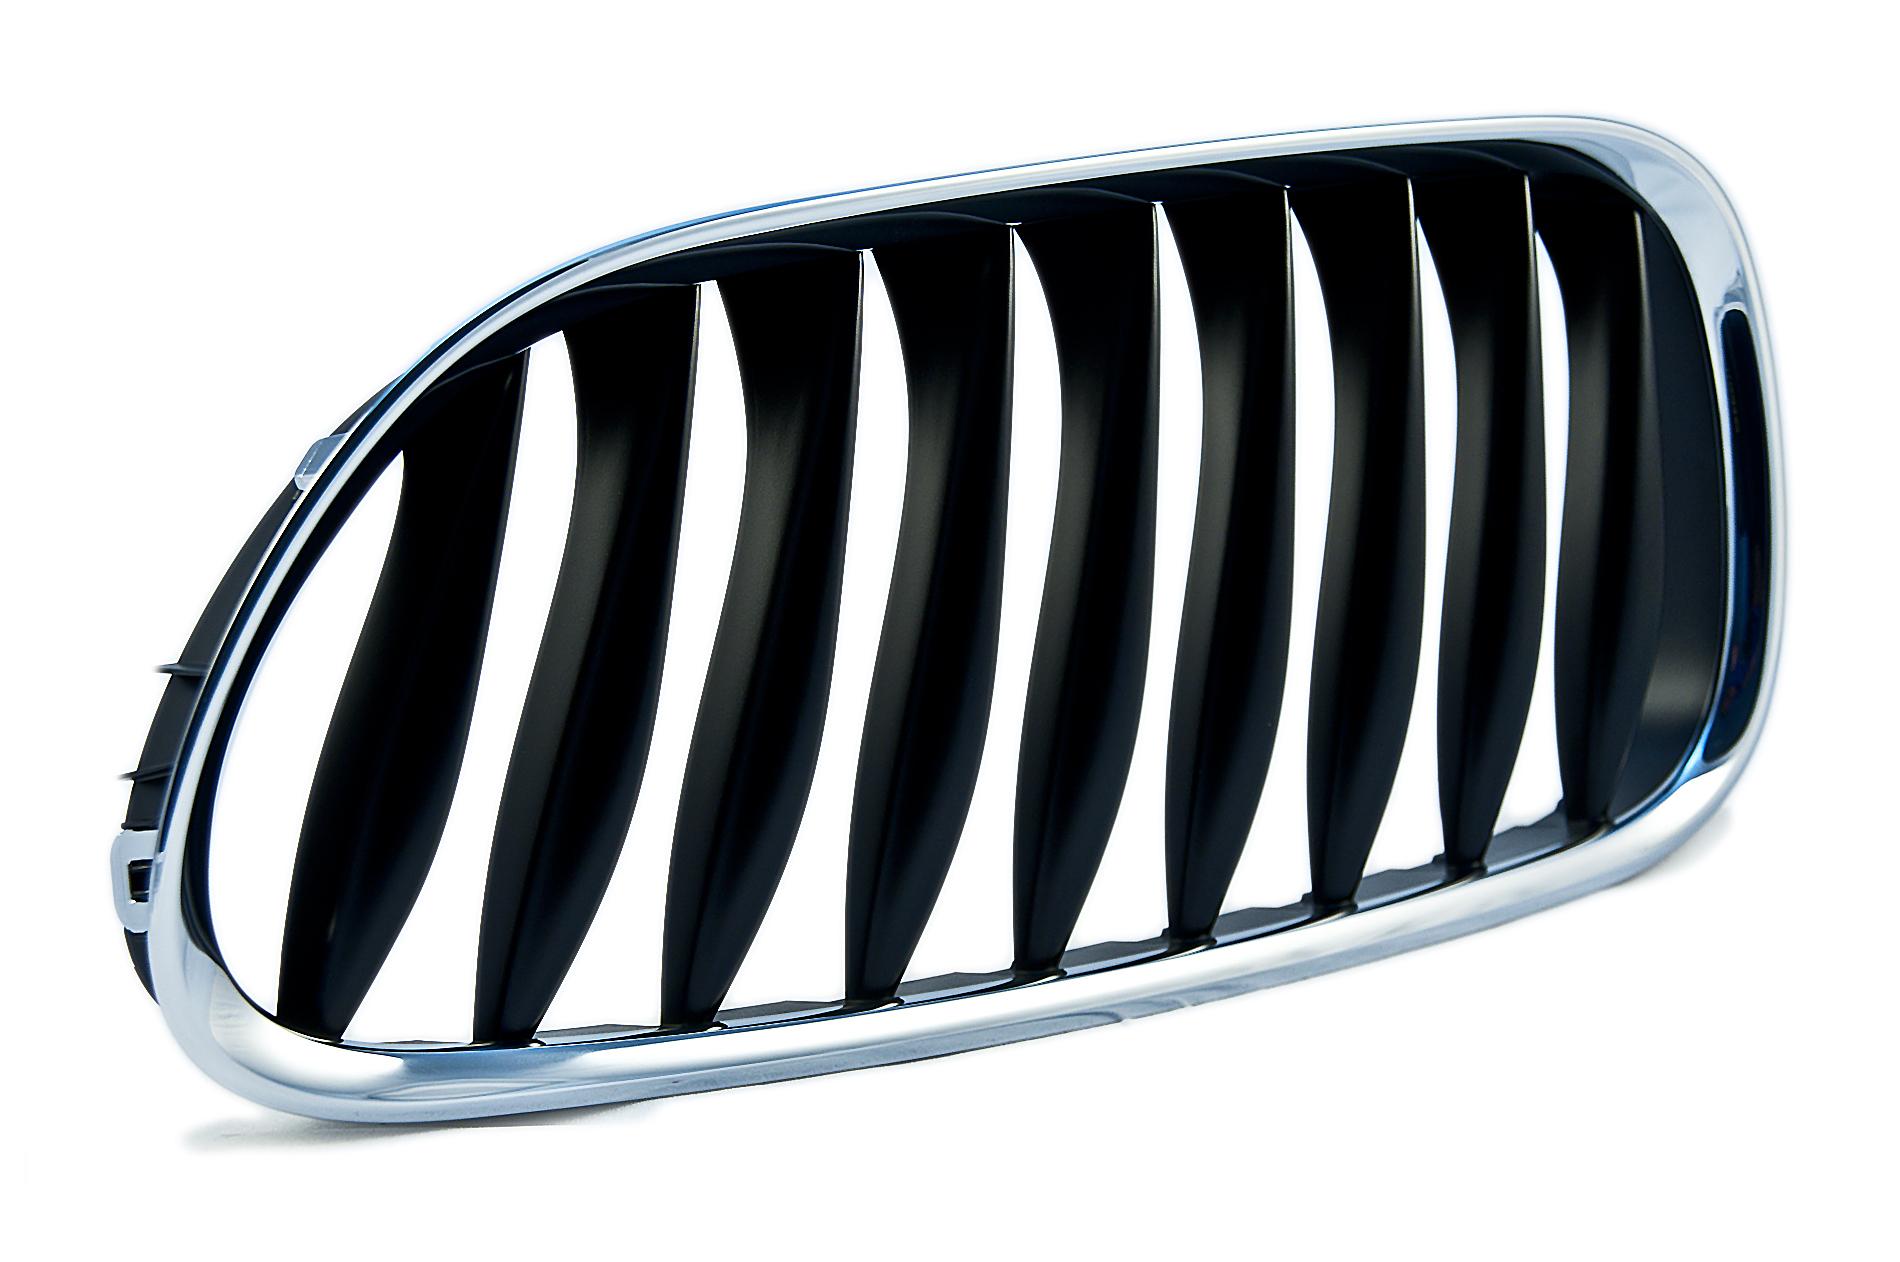 Bmw E85 E86 Z4 2002-2008 Front Kidney Grille Chrome Silver Slats Driver Side